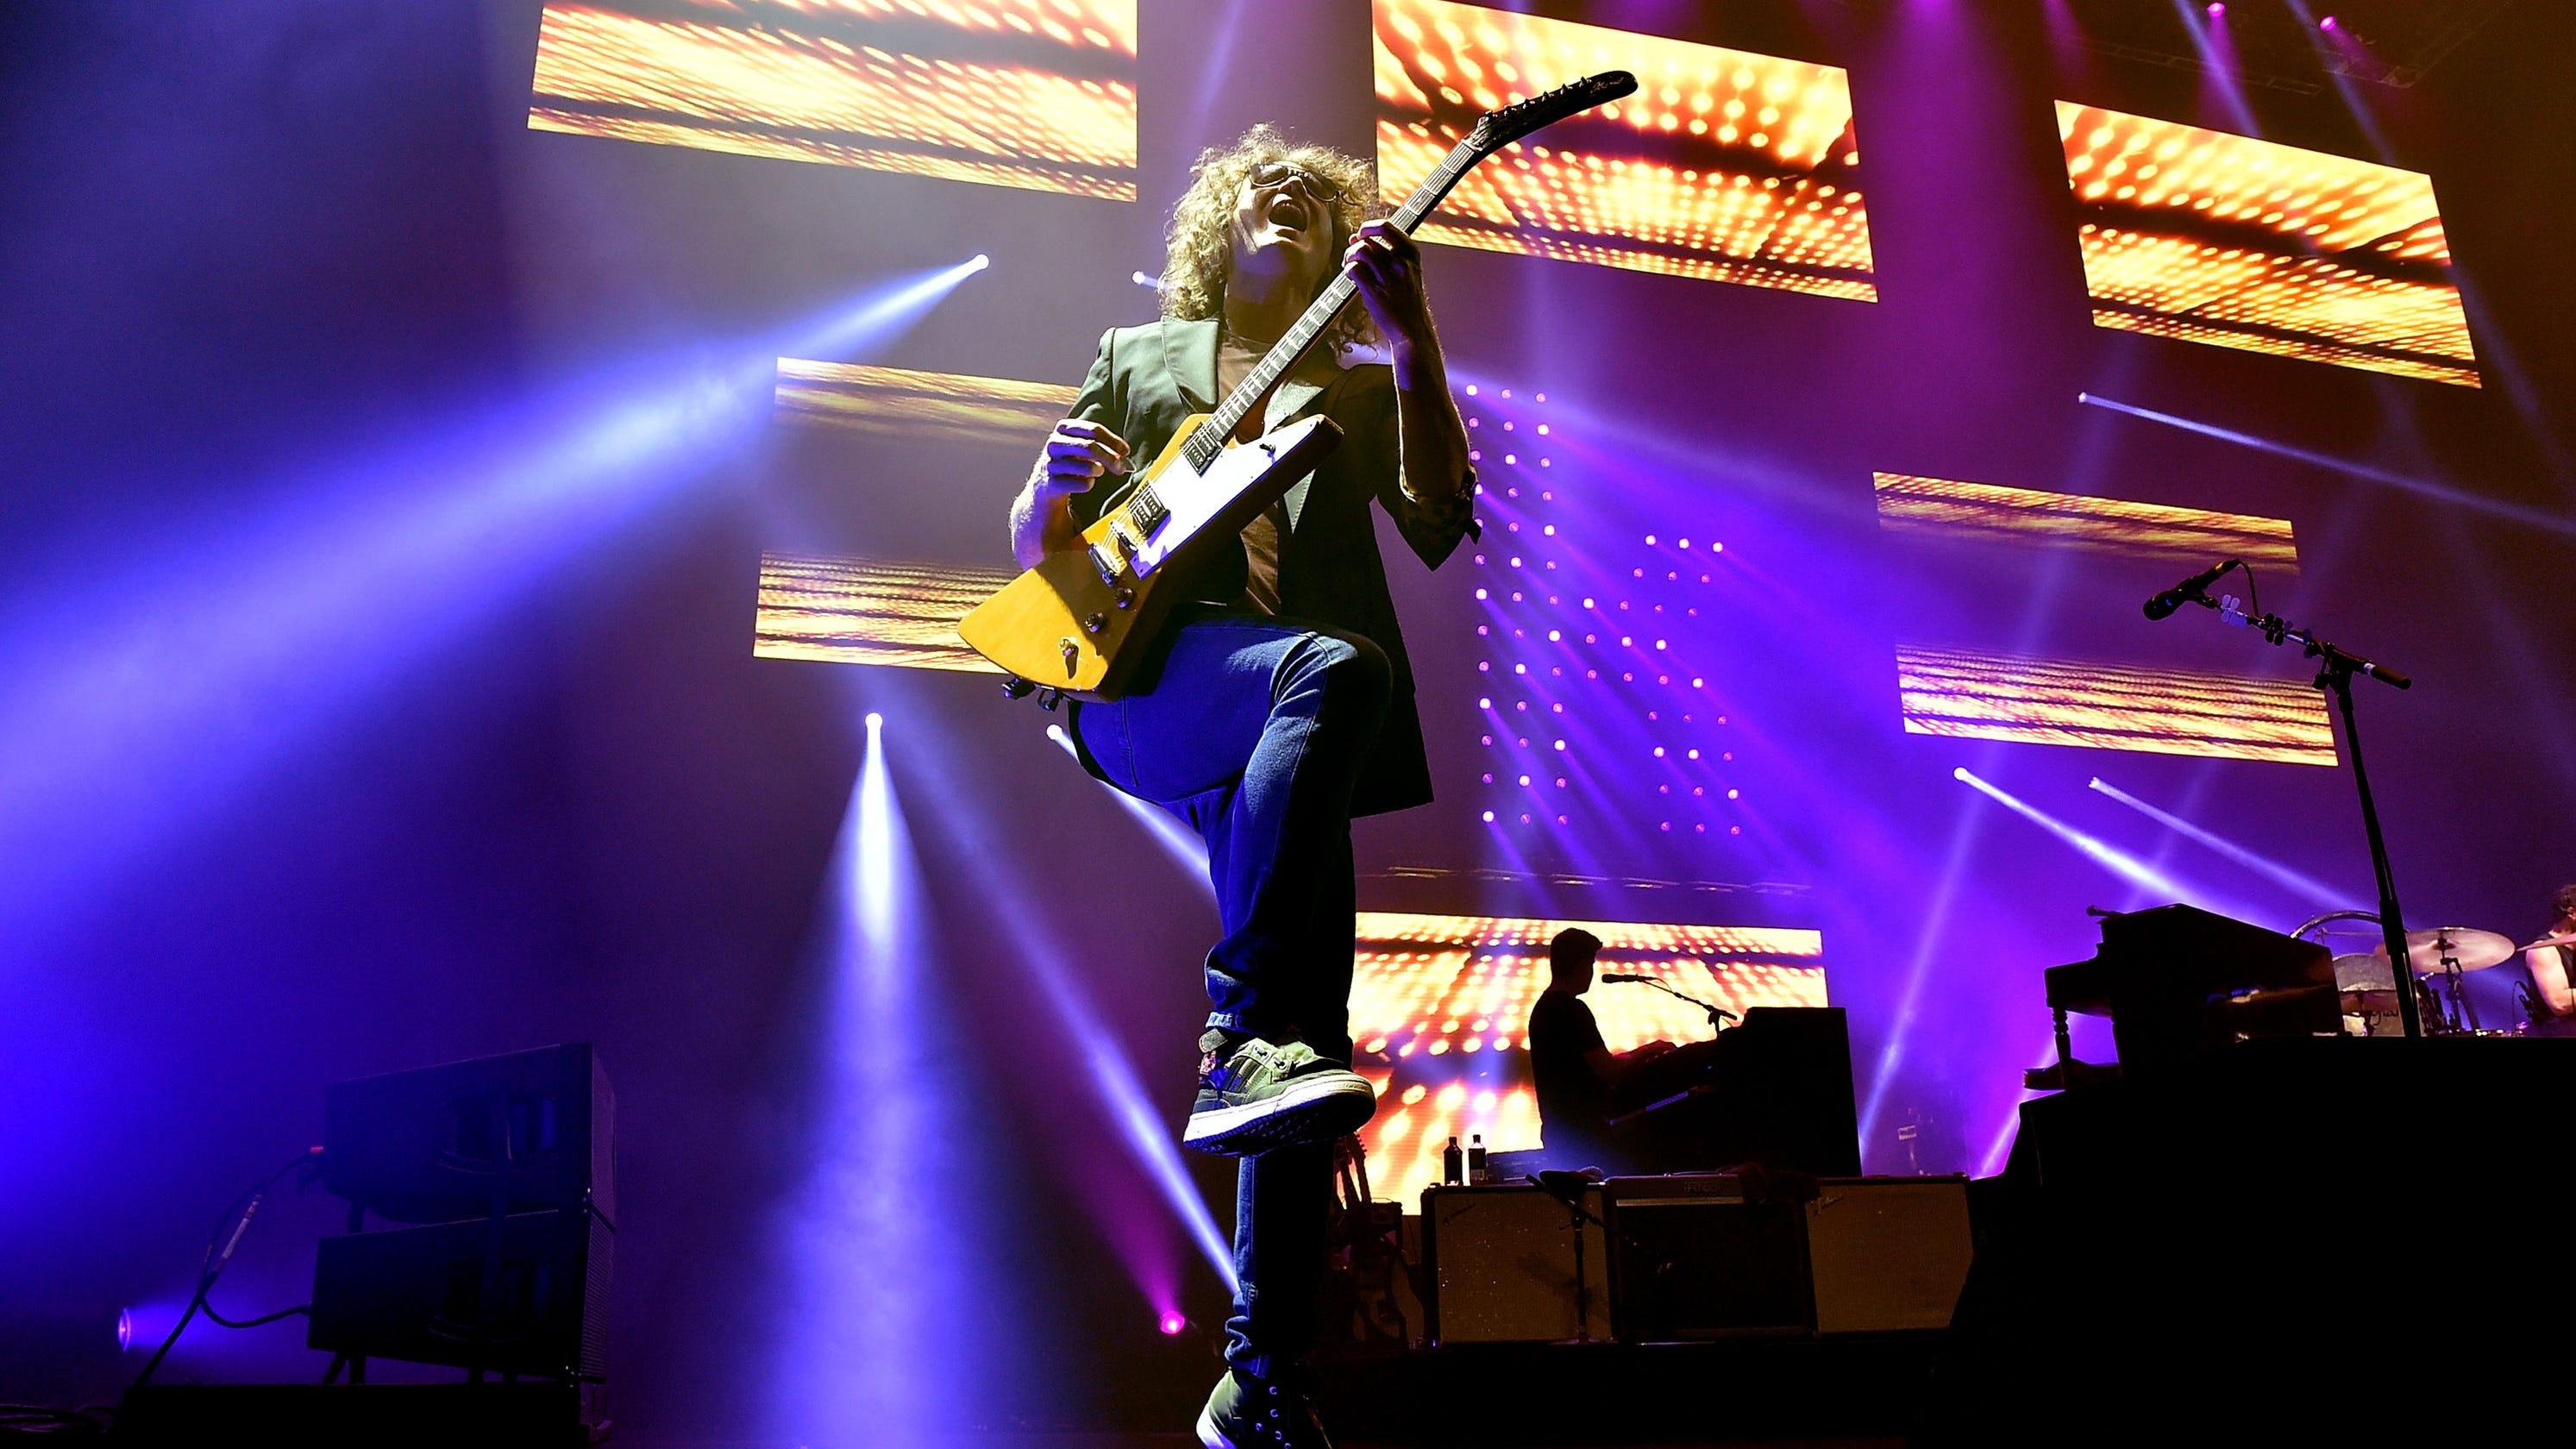 Mr. Brightside\': Meet the Iowan behind The Killers\' song